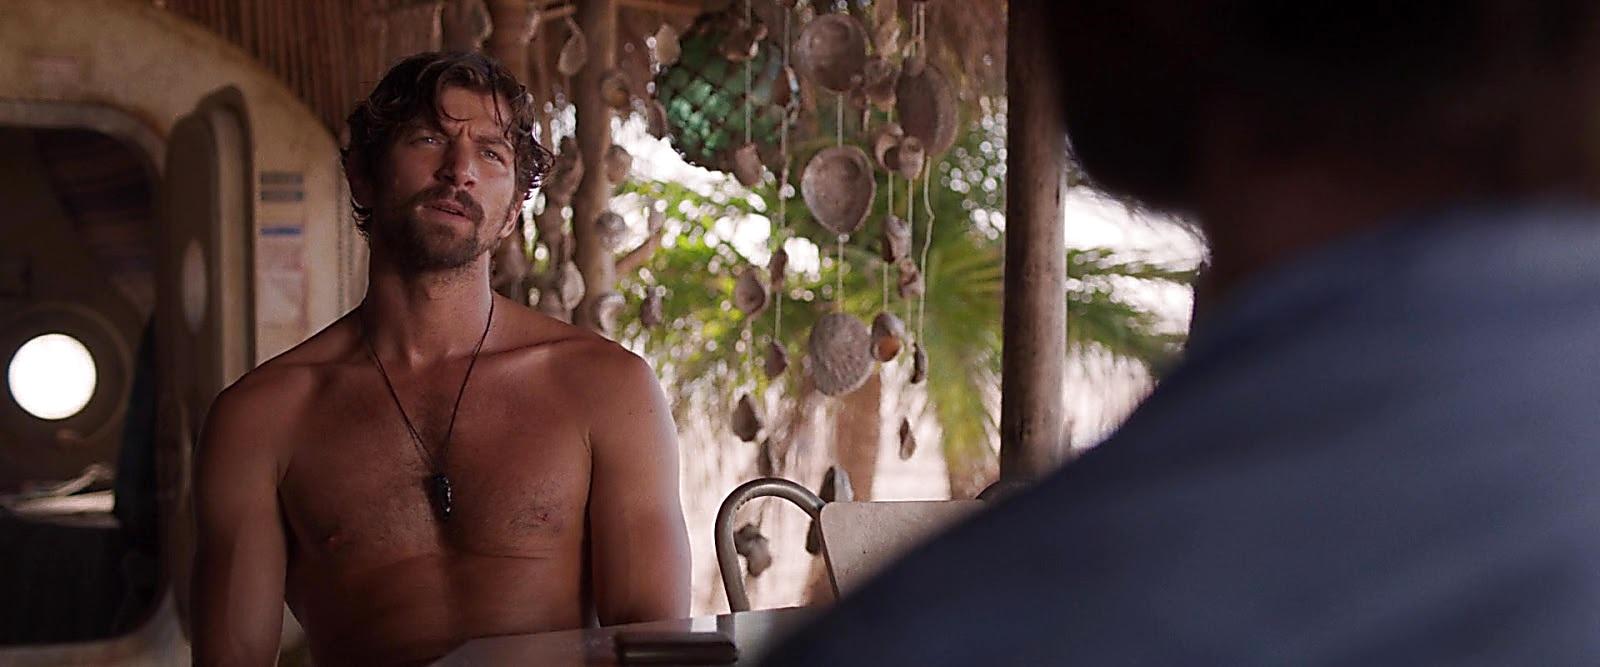 Michiel Huisman sexy shirtless scene July 31, 2019, 3pm